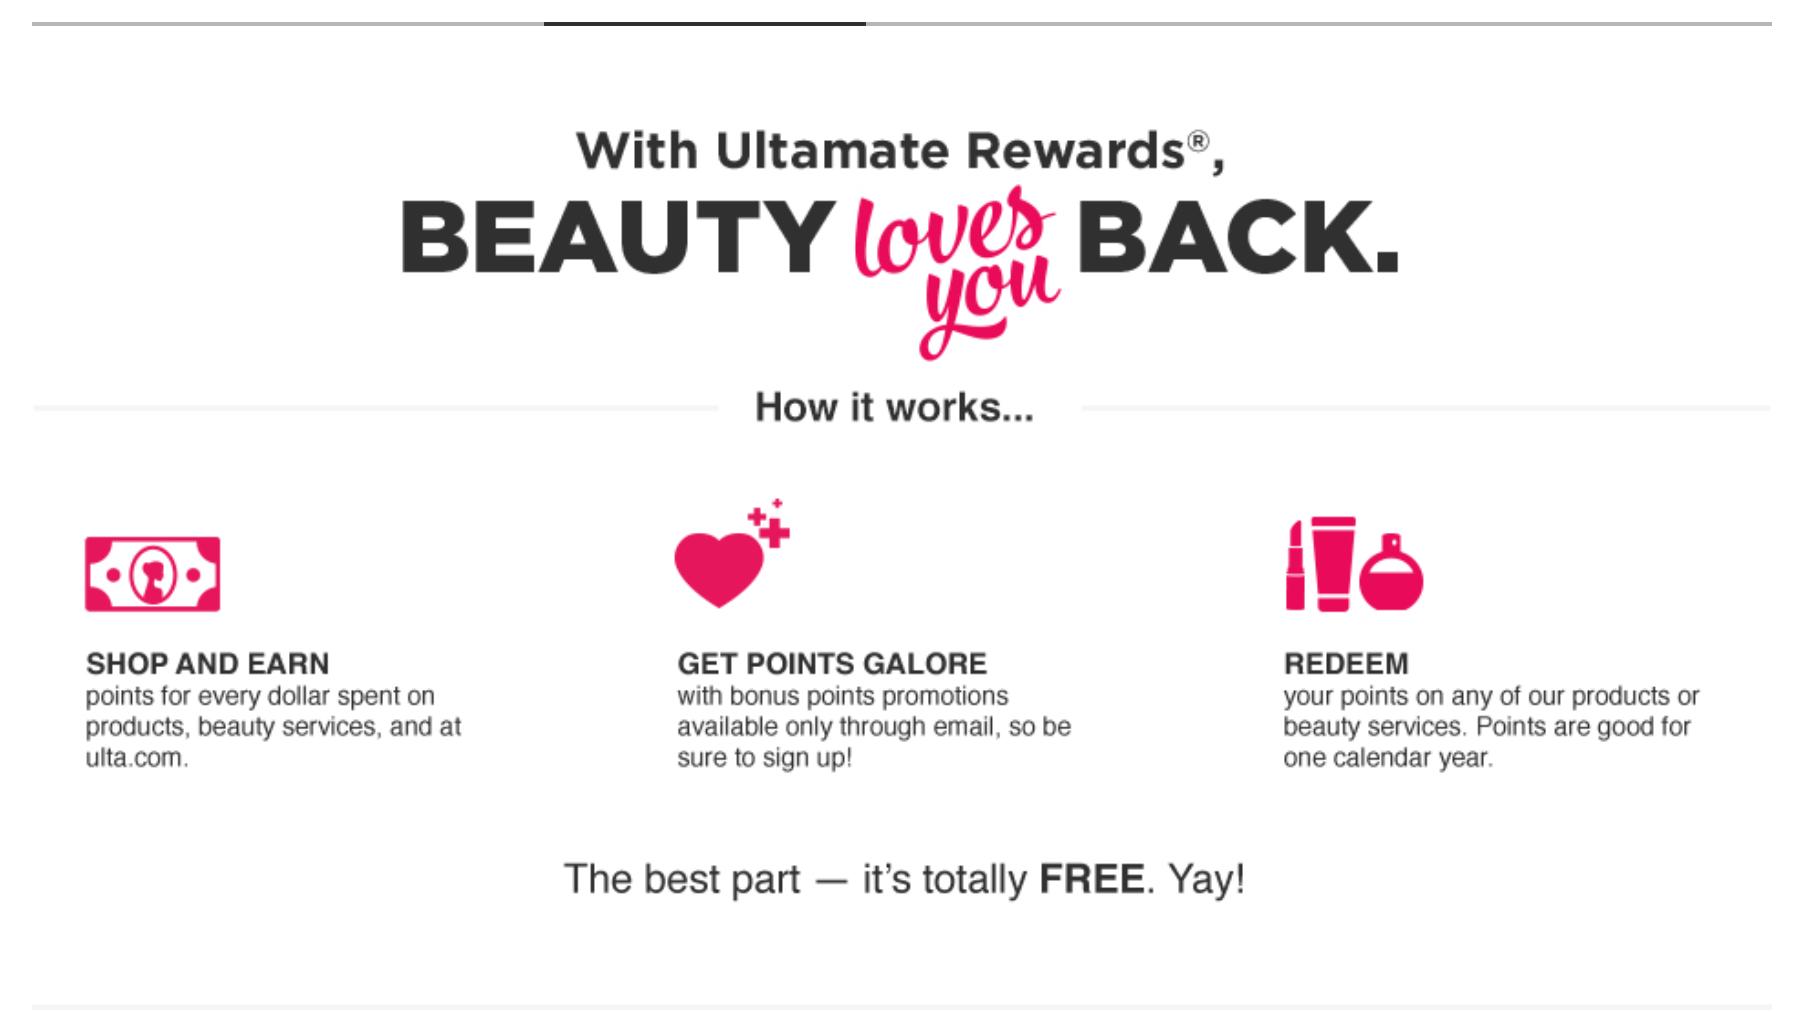 ulta-reward-loyalty-program-example